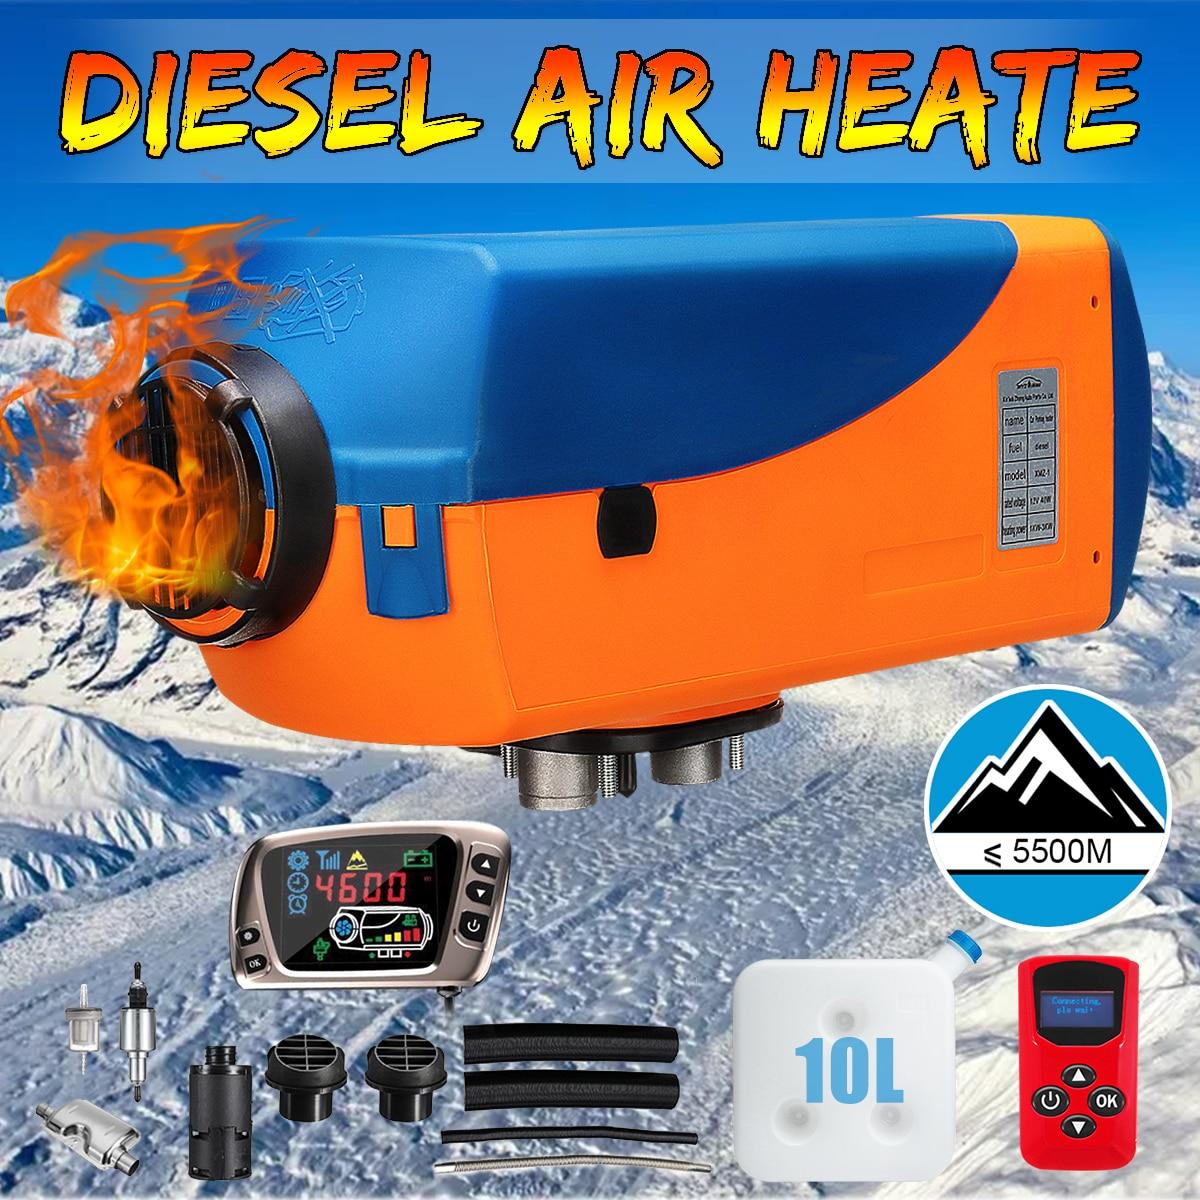 12 В 8KW парковка Air Diesels подогреватель топлива ЖК дисплей переключатель 8000 Вт автомобиля нагреватель для Контроллер заряда батареи Motorhome груз...